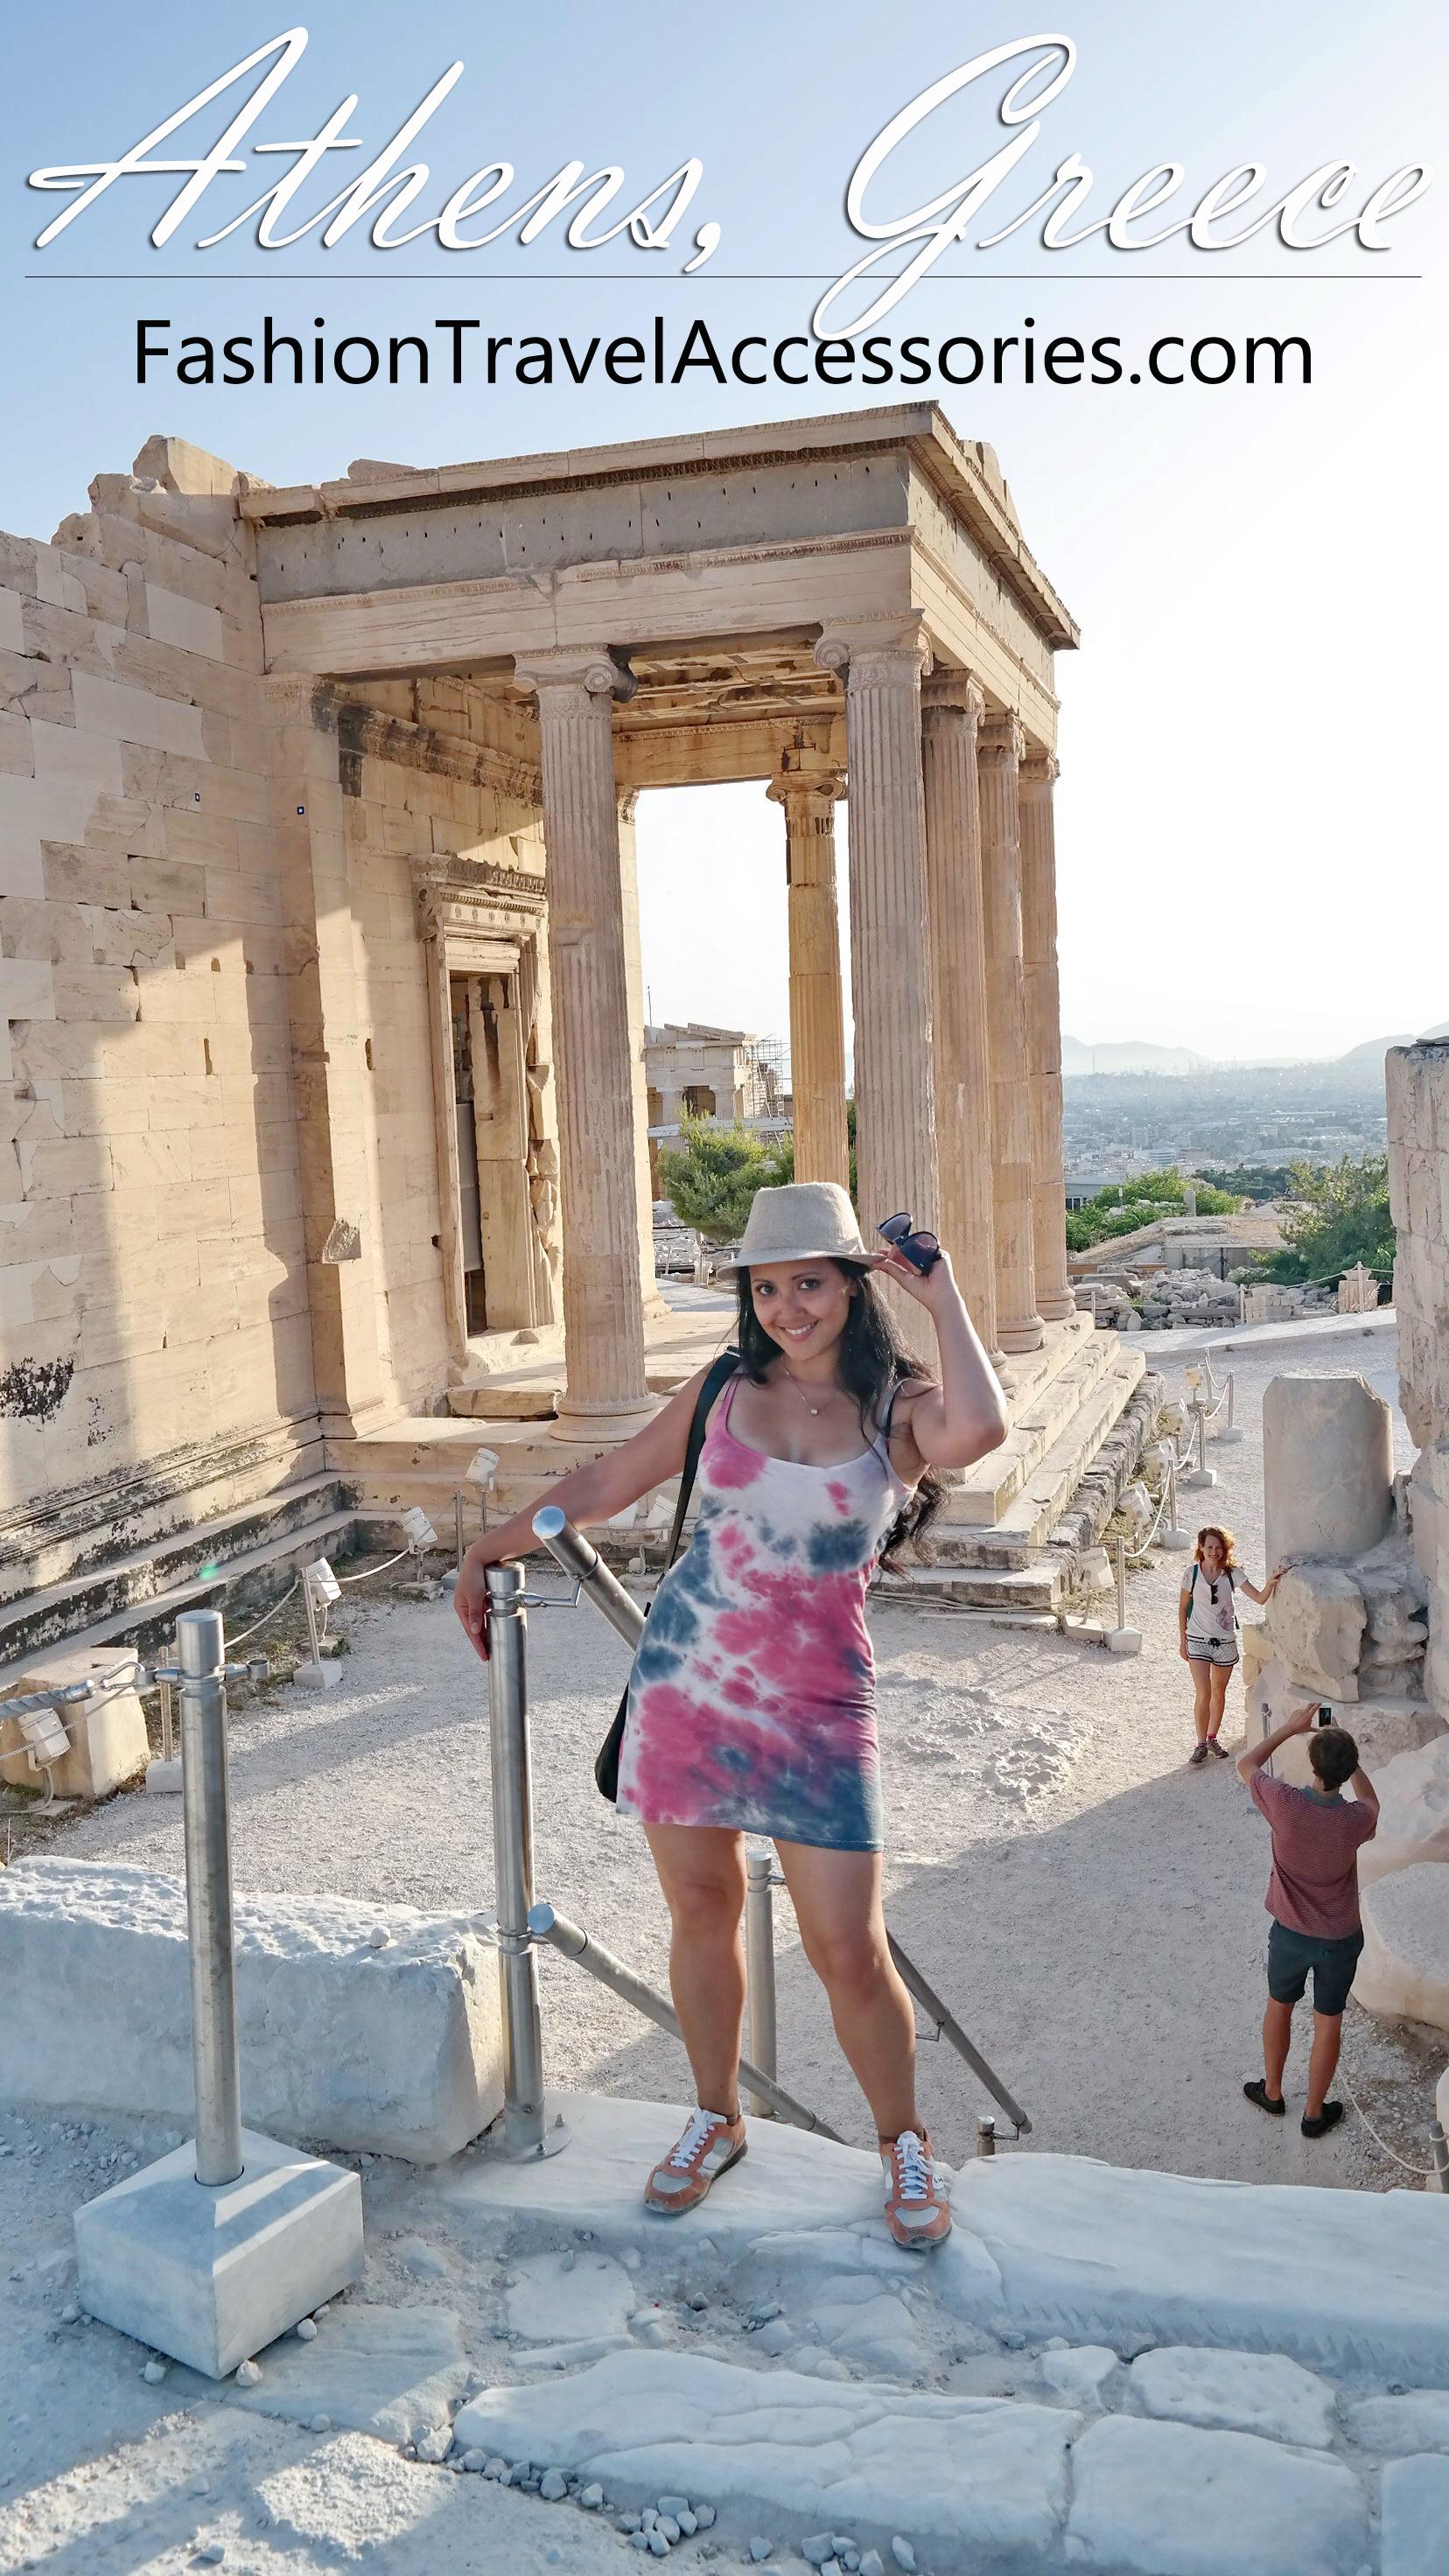 What-to-wear-in-Greece-Athens-Mykonos-Santorini-in-summer-3